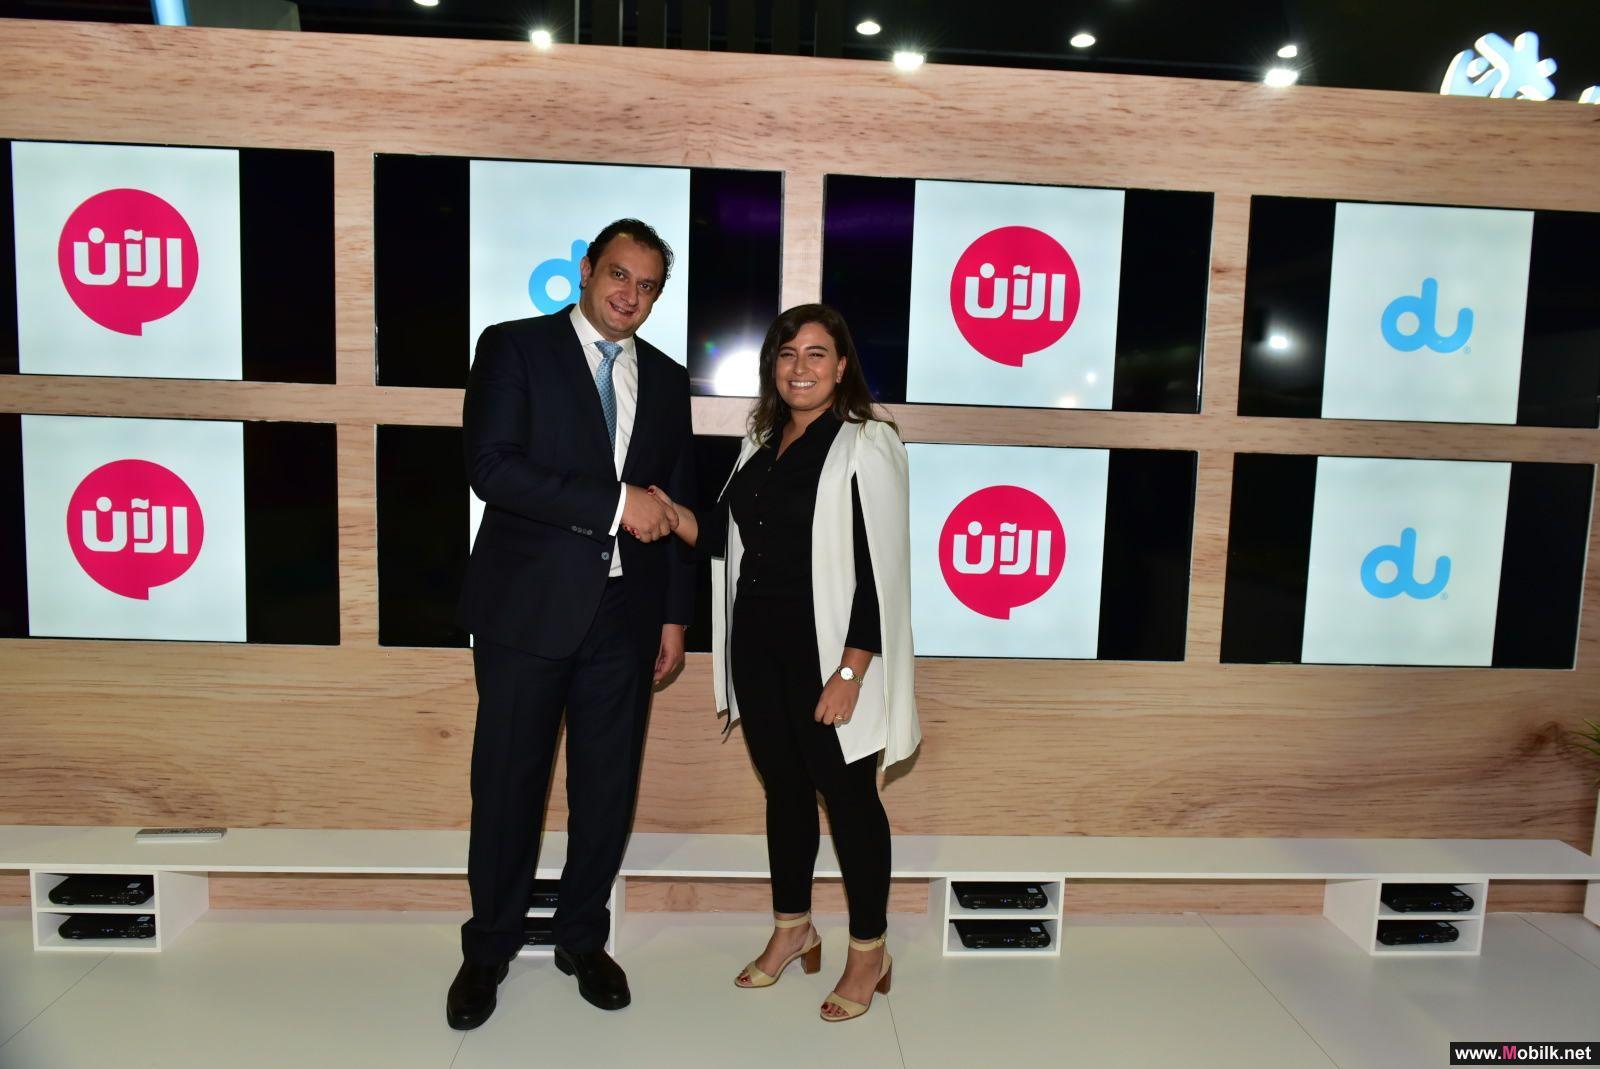 دو وتلفزيون الآن يتعاونان خلال معرض